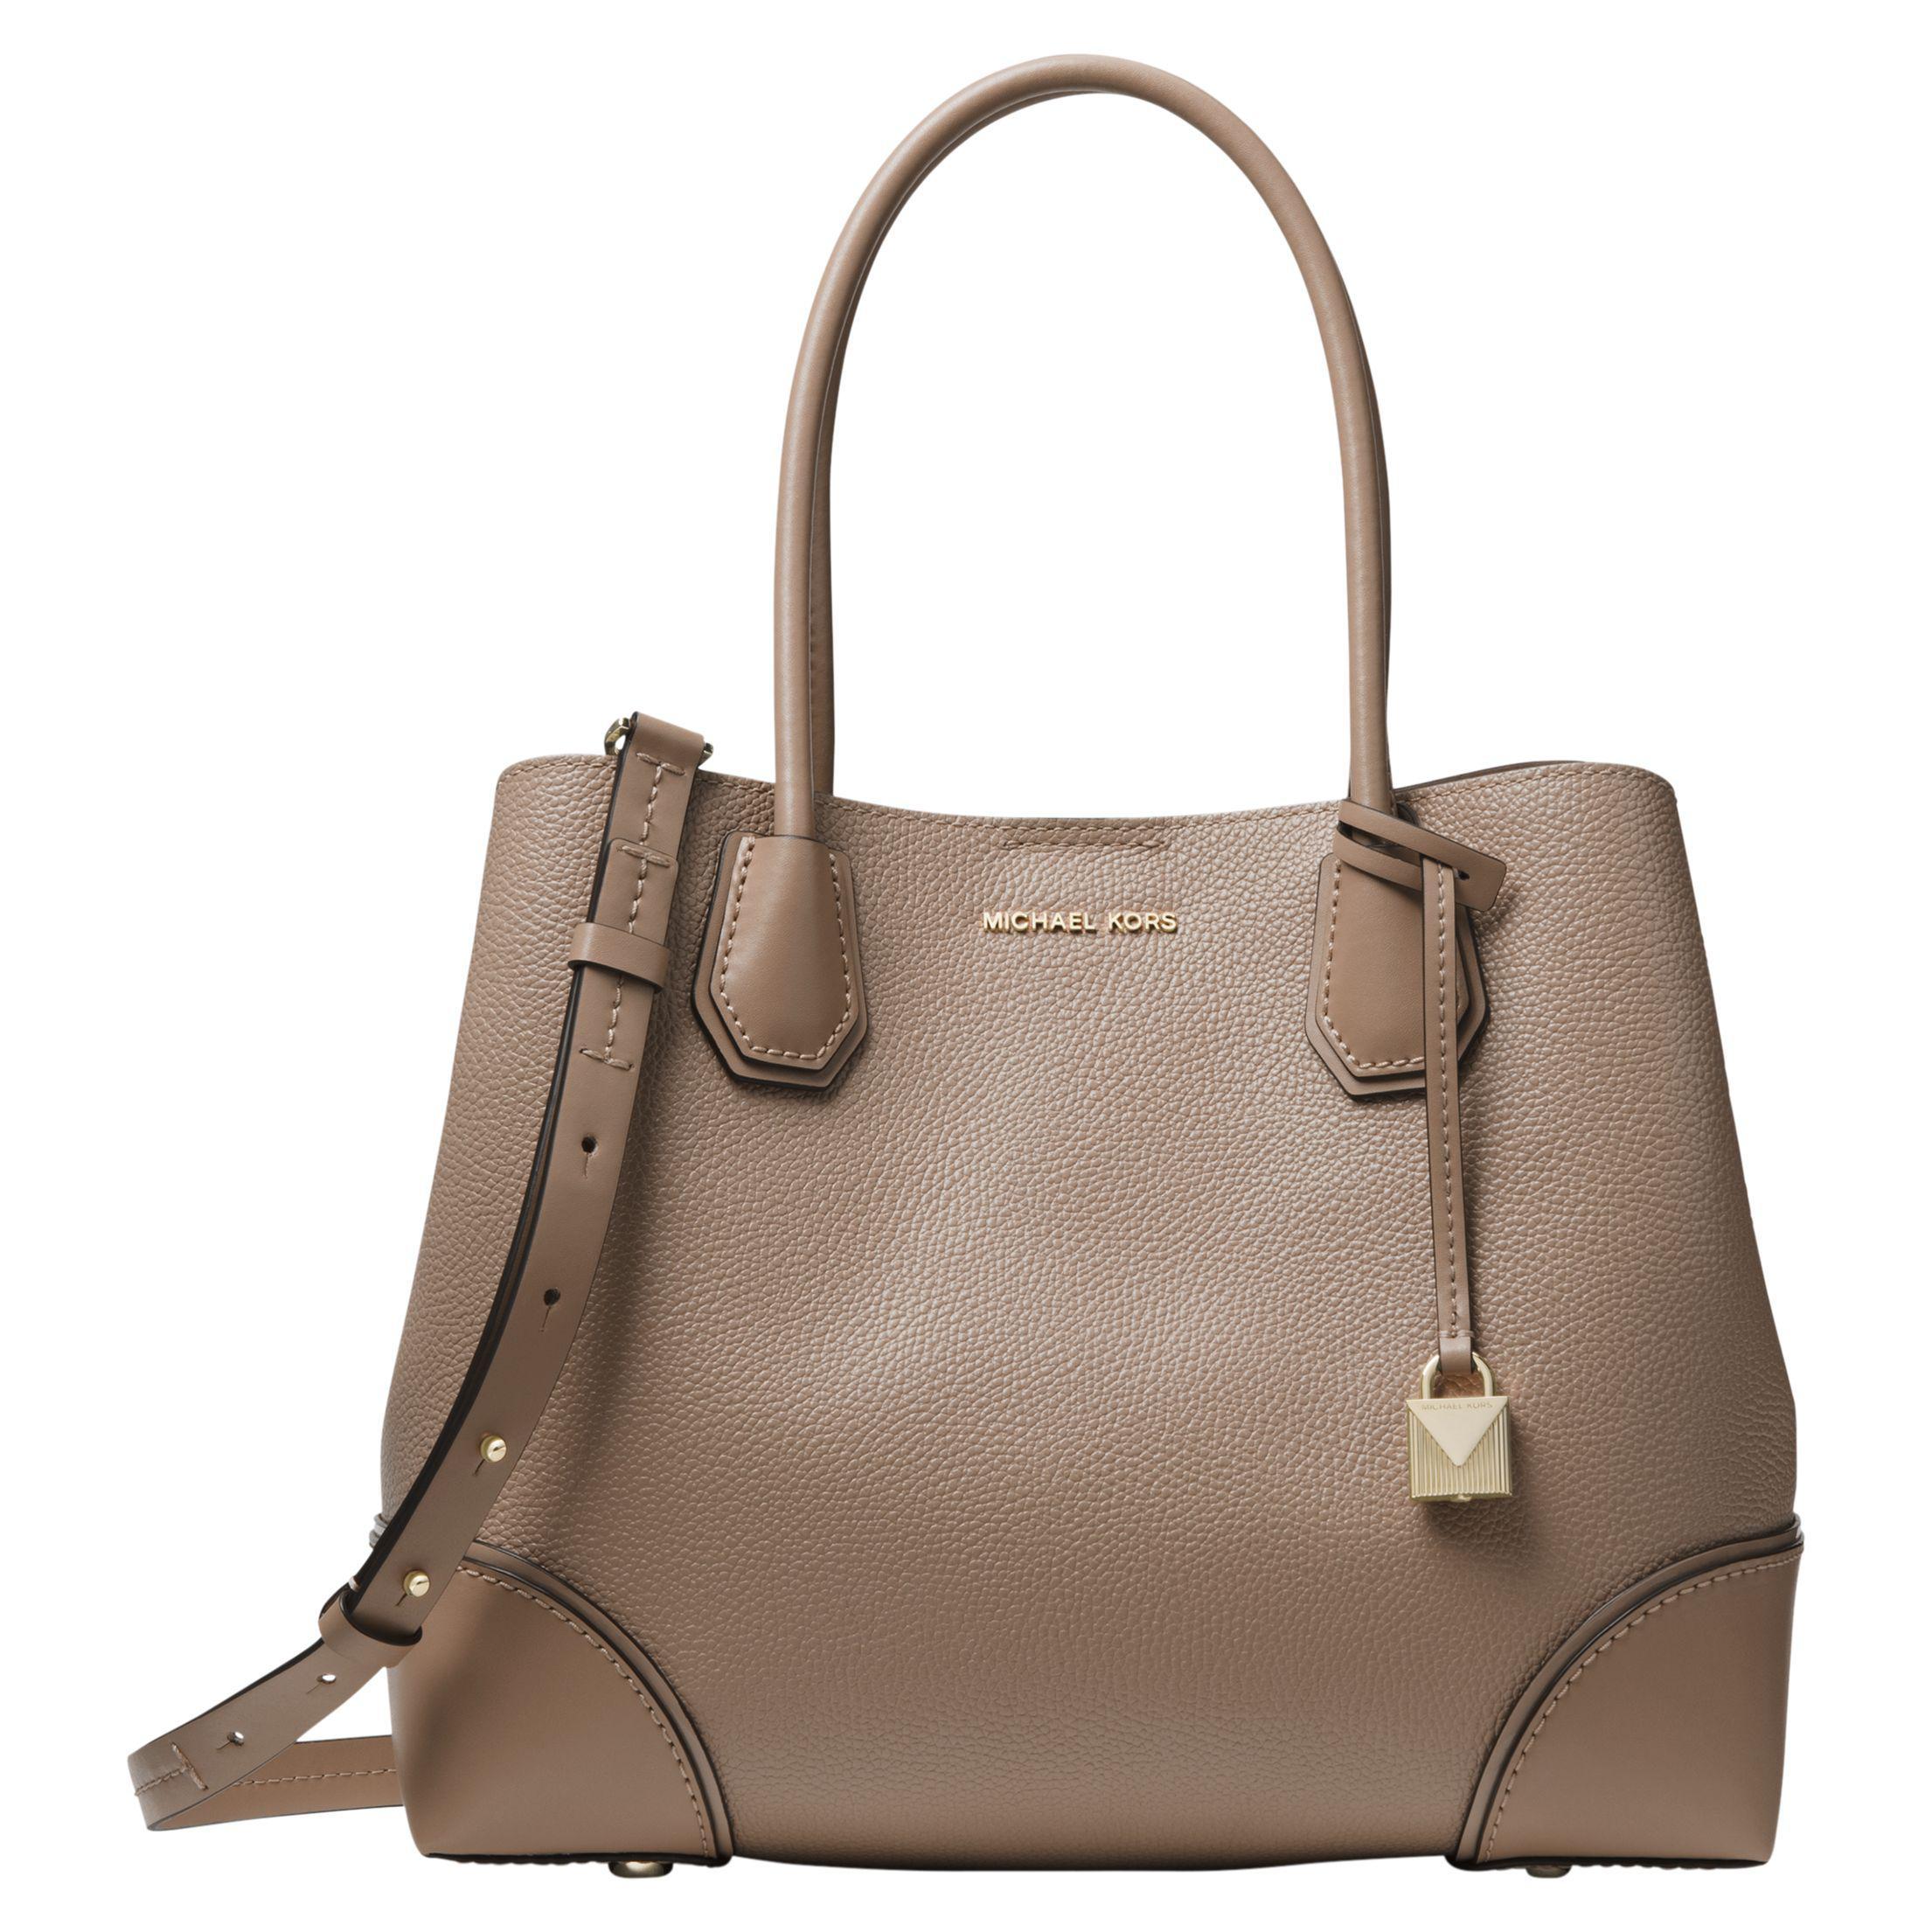 72a73409de62 Michael Kors Michael Mercer Gallery Medium Leather Tote Bag in Brown ...